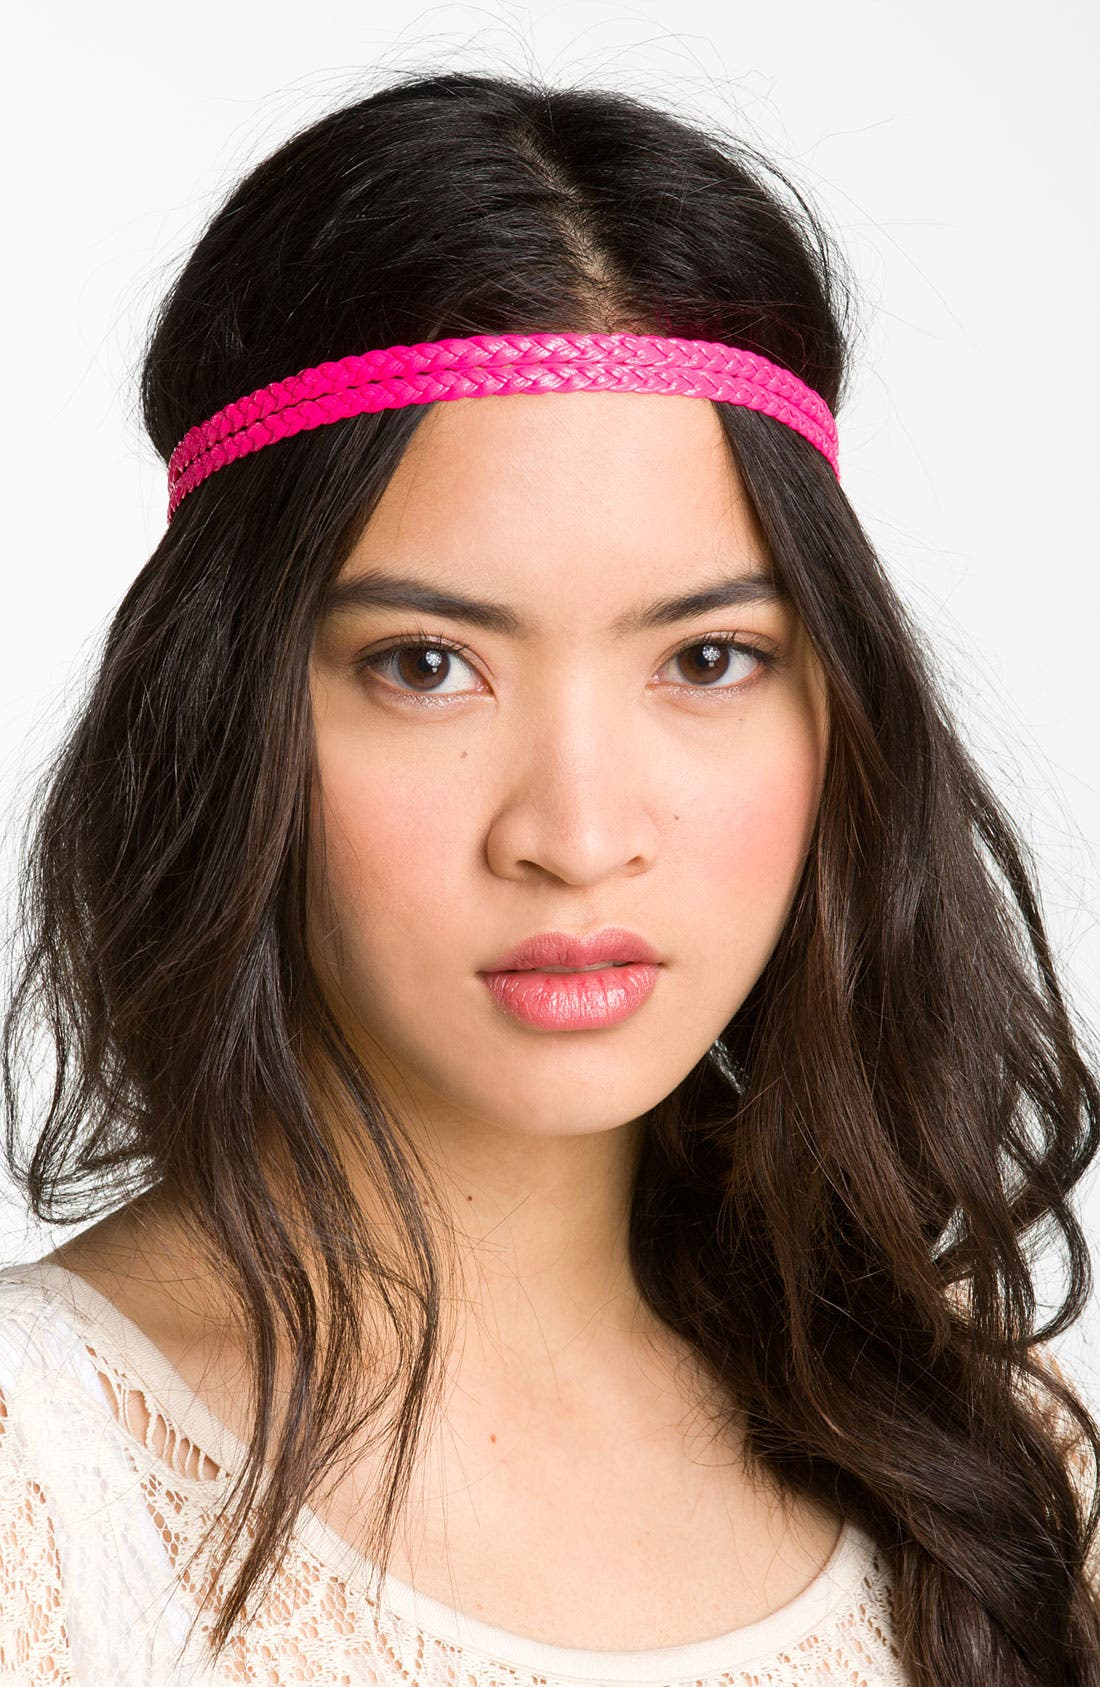 Alternate Image 1 Selected - Carole Braided Neon Headband